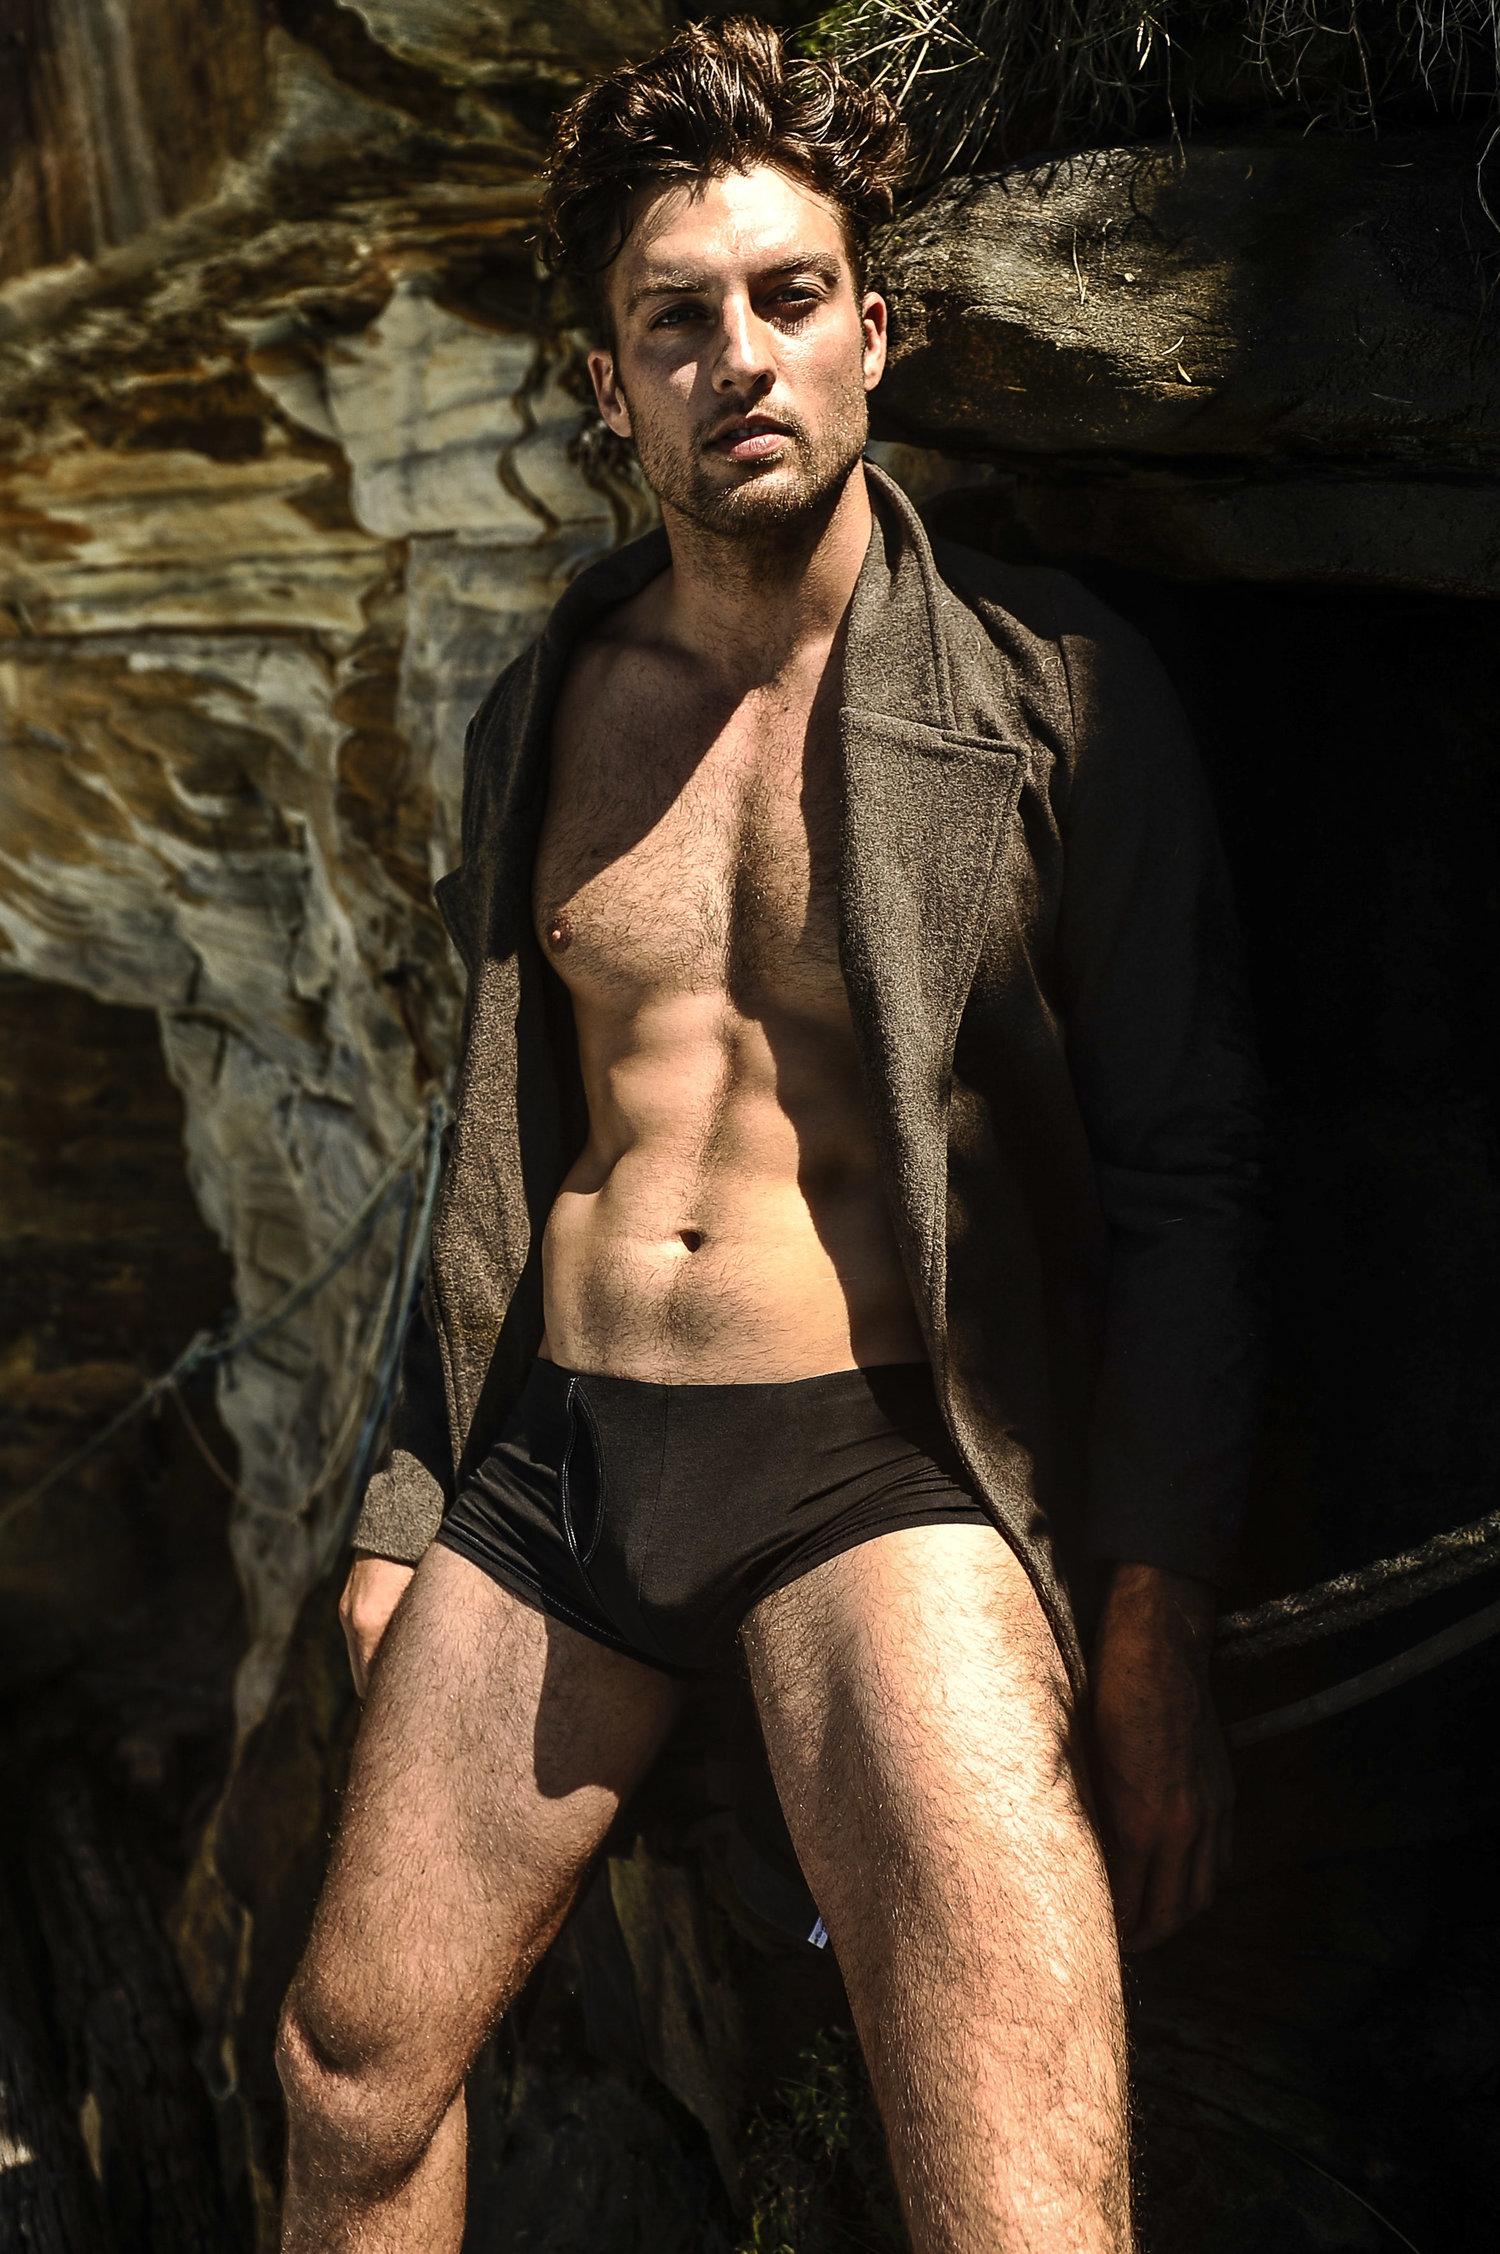 Adon Exclusive: Model Rohan Maclaren By Vincent Fahey